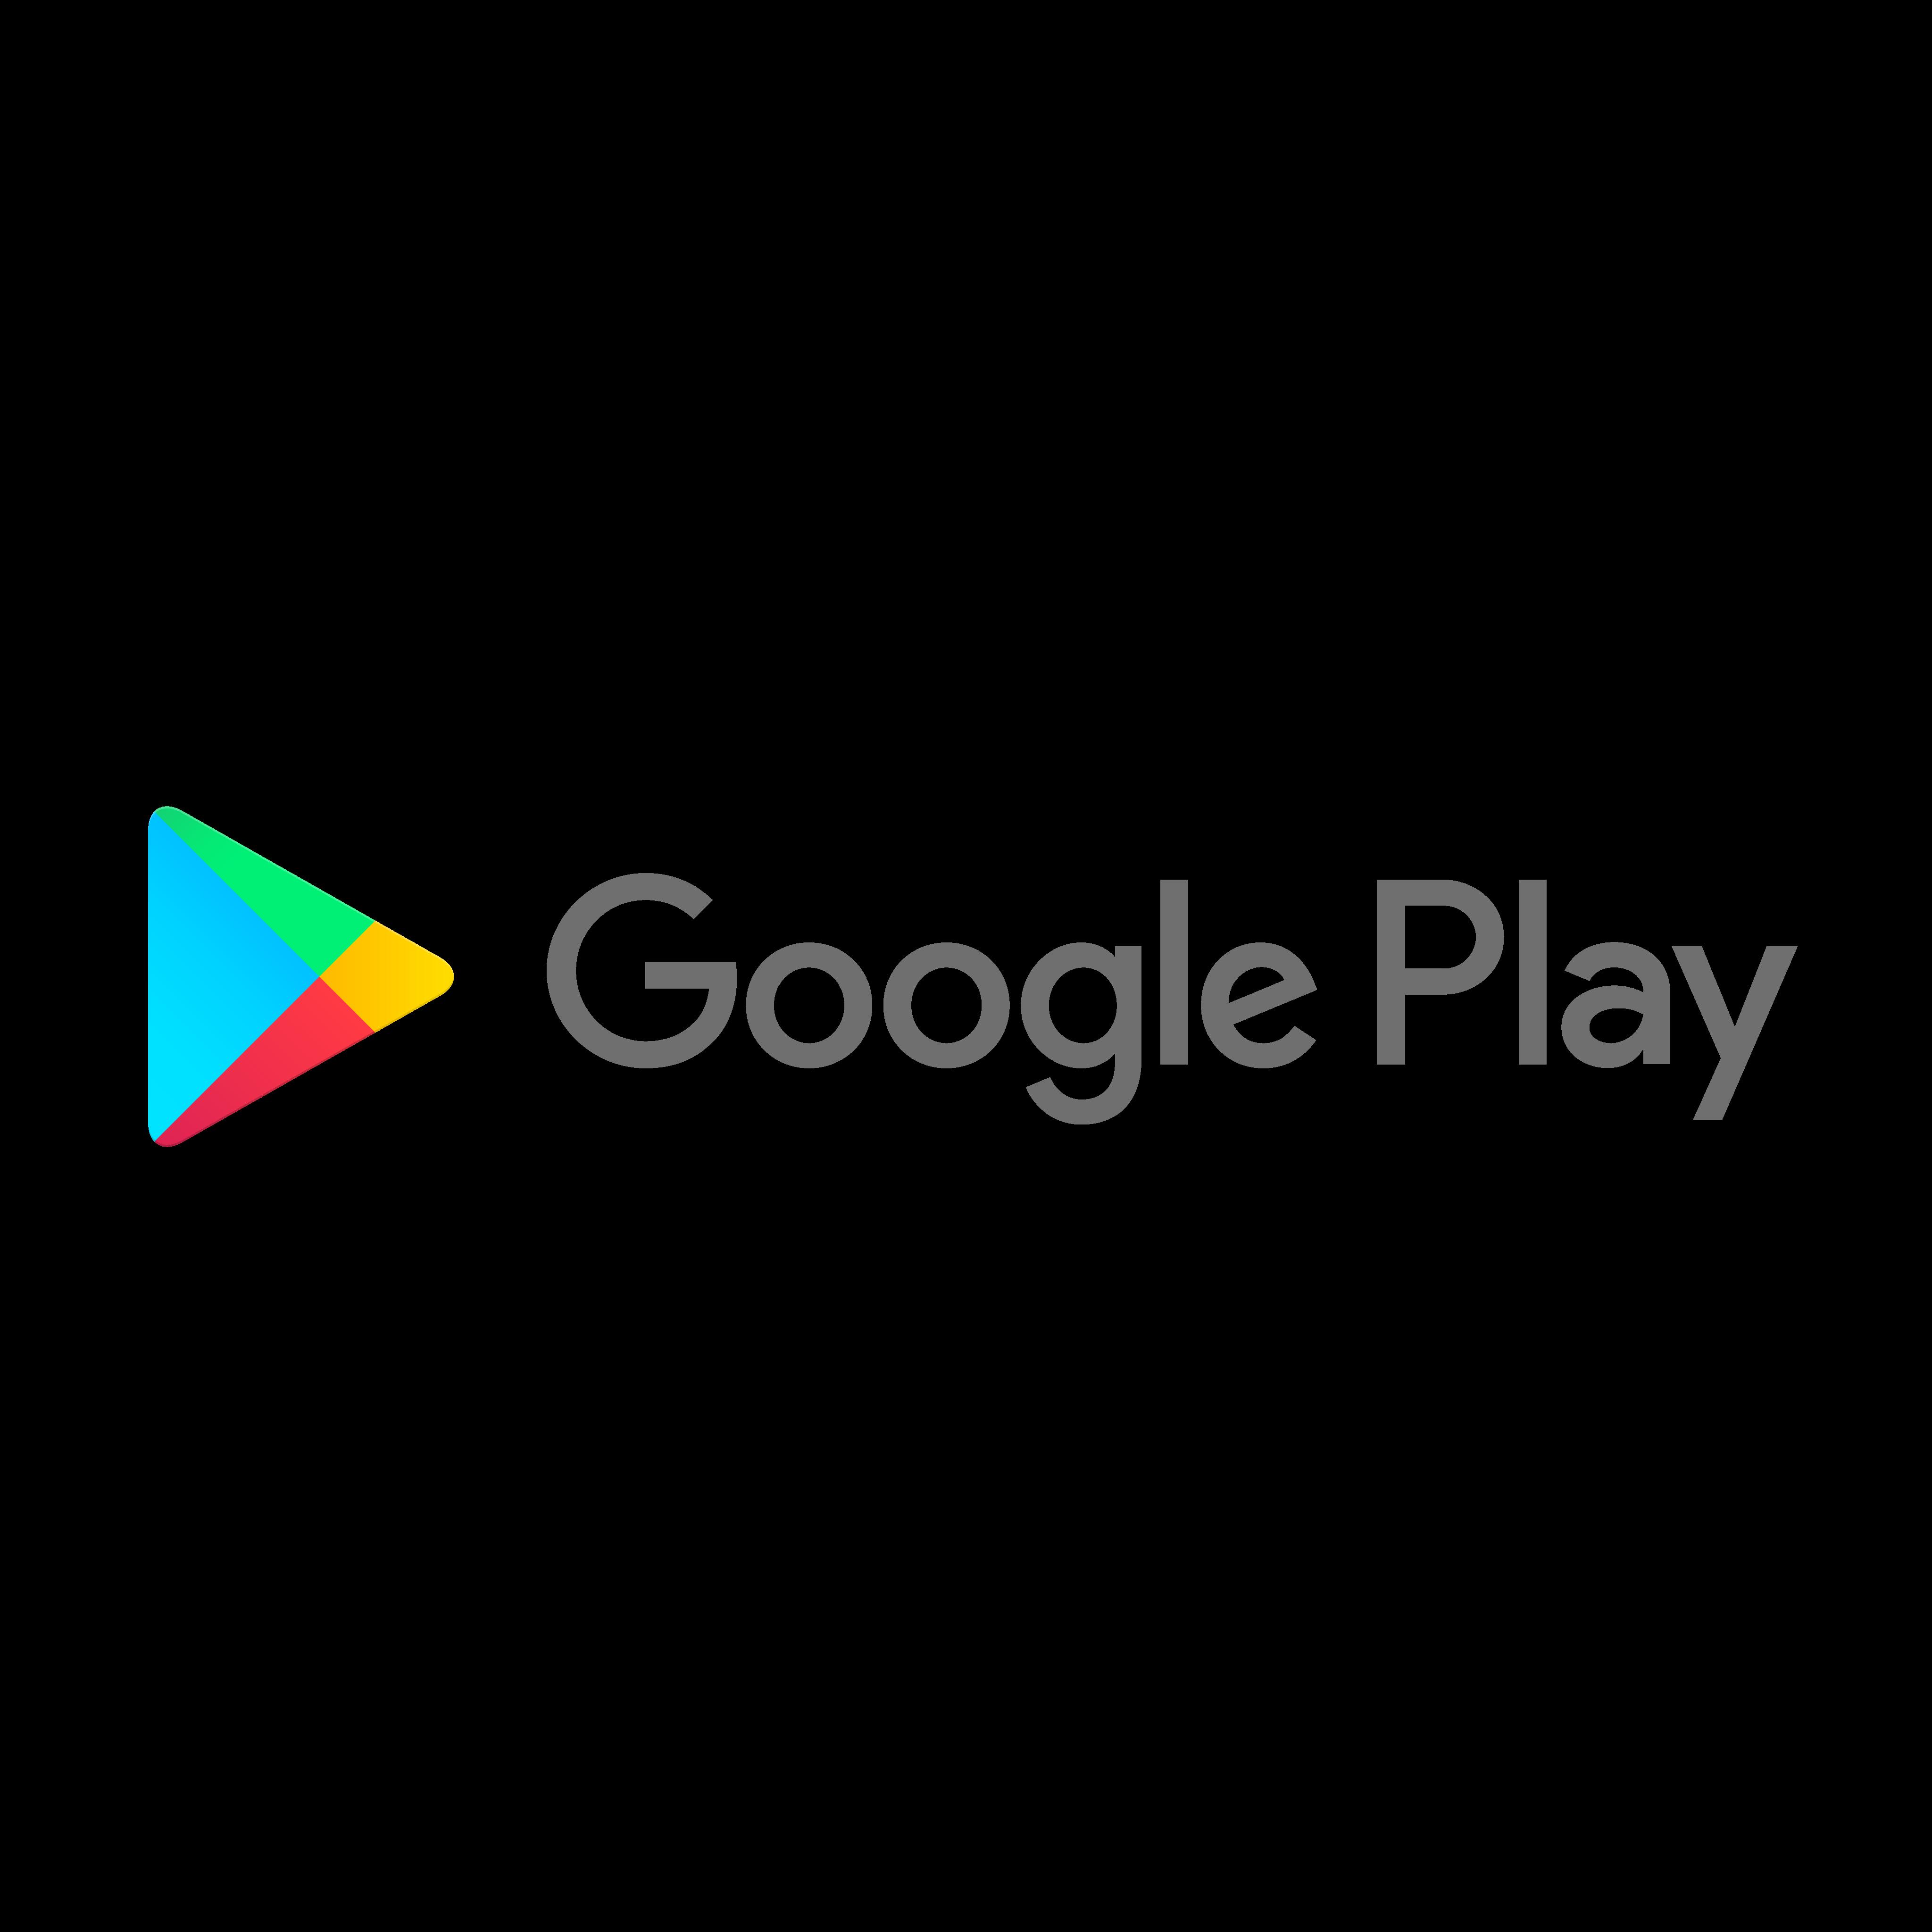 google play logo 0 - Google Play Logo